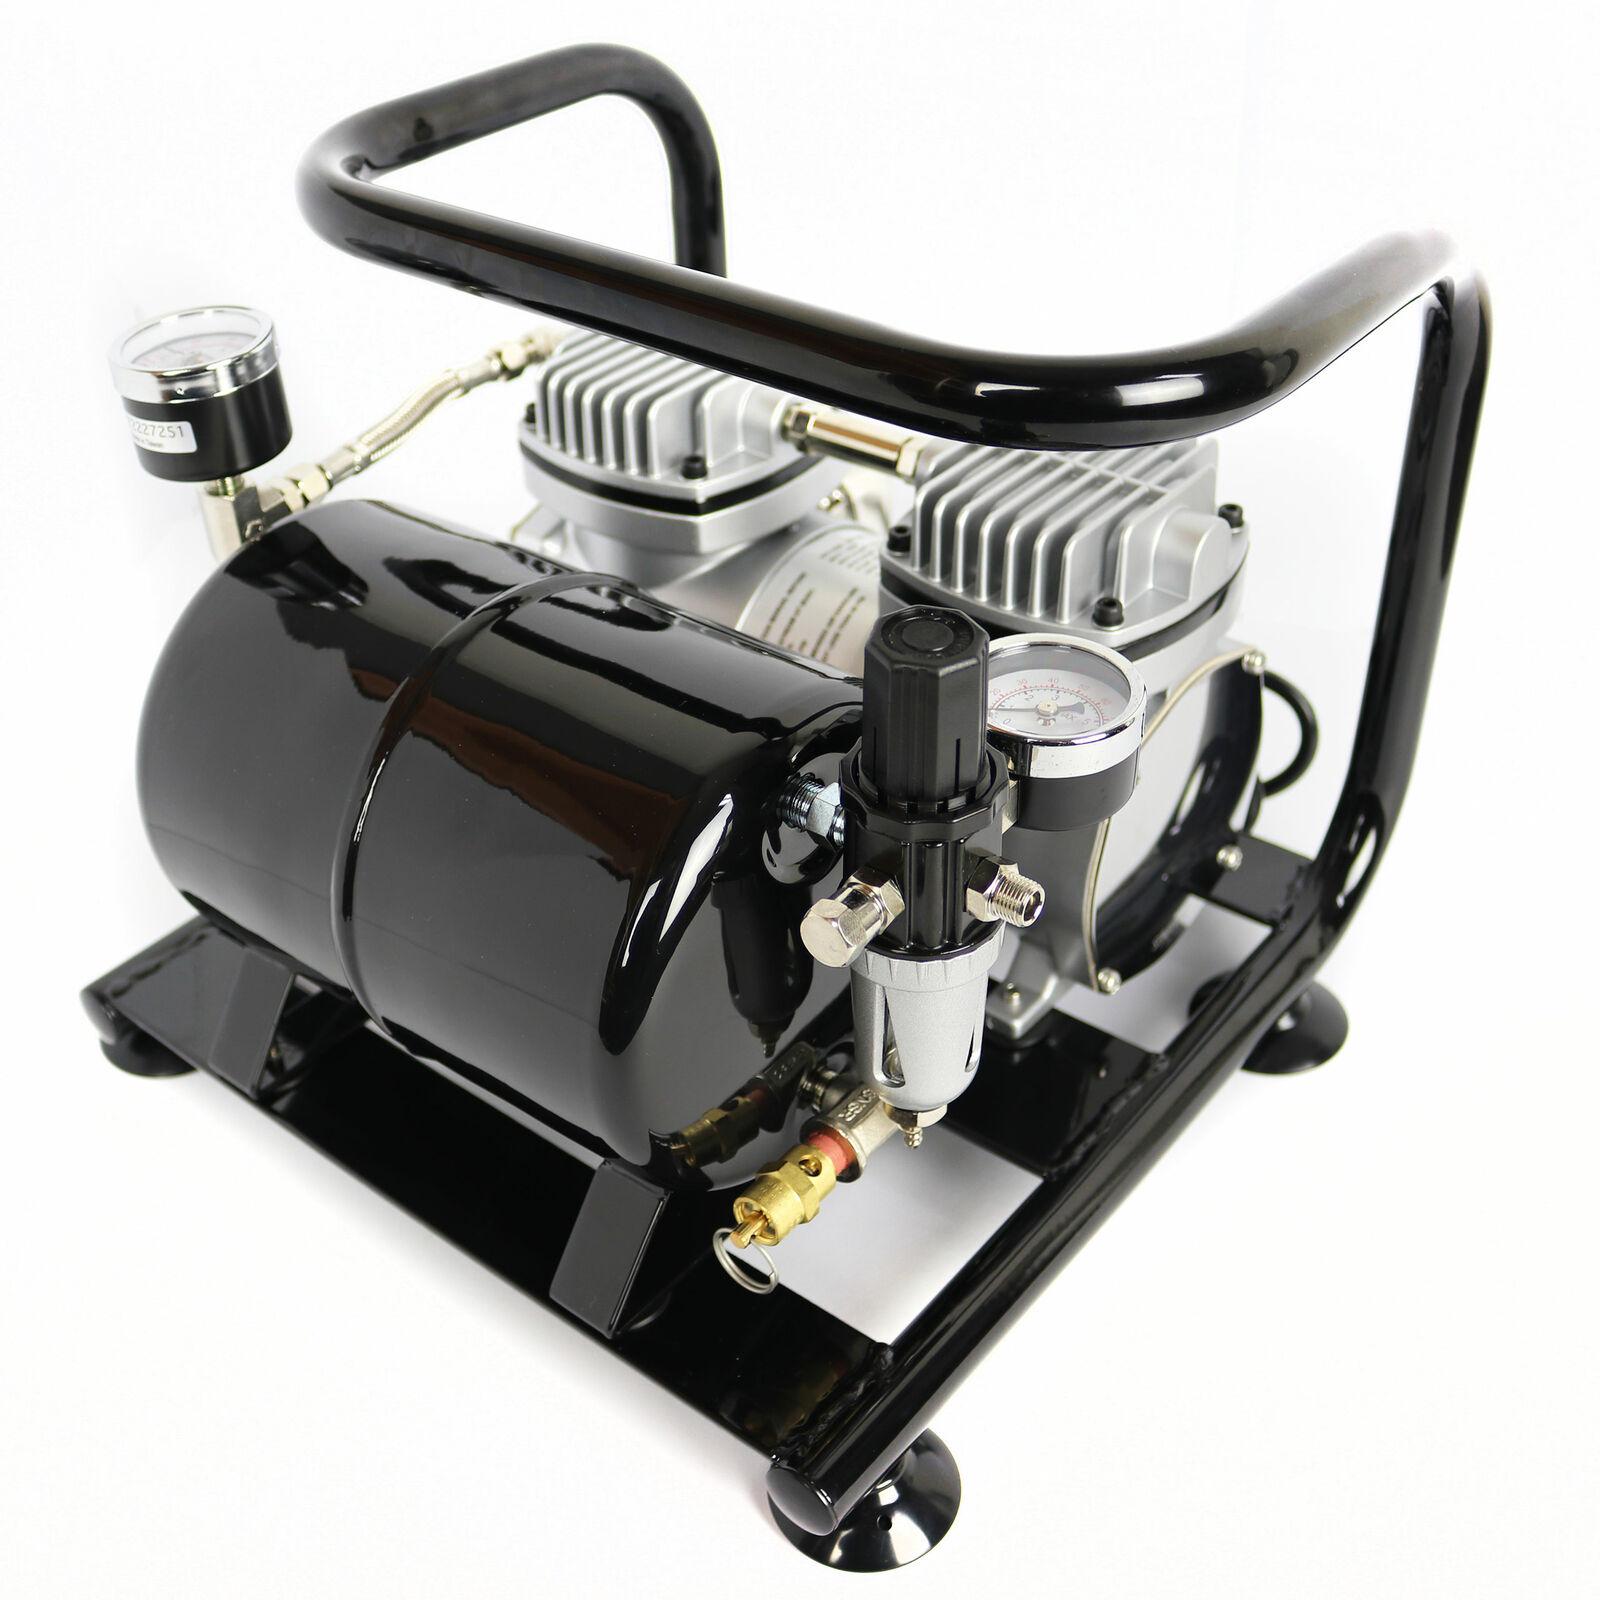 Kompressor Airbrush Sparmax AC-55 Black edition Druckluft Kompressoren